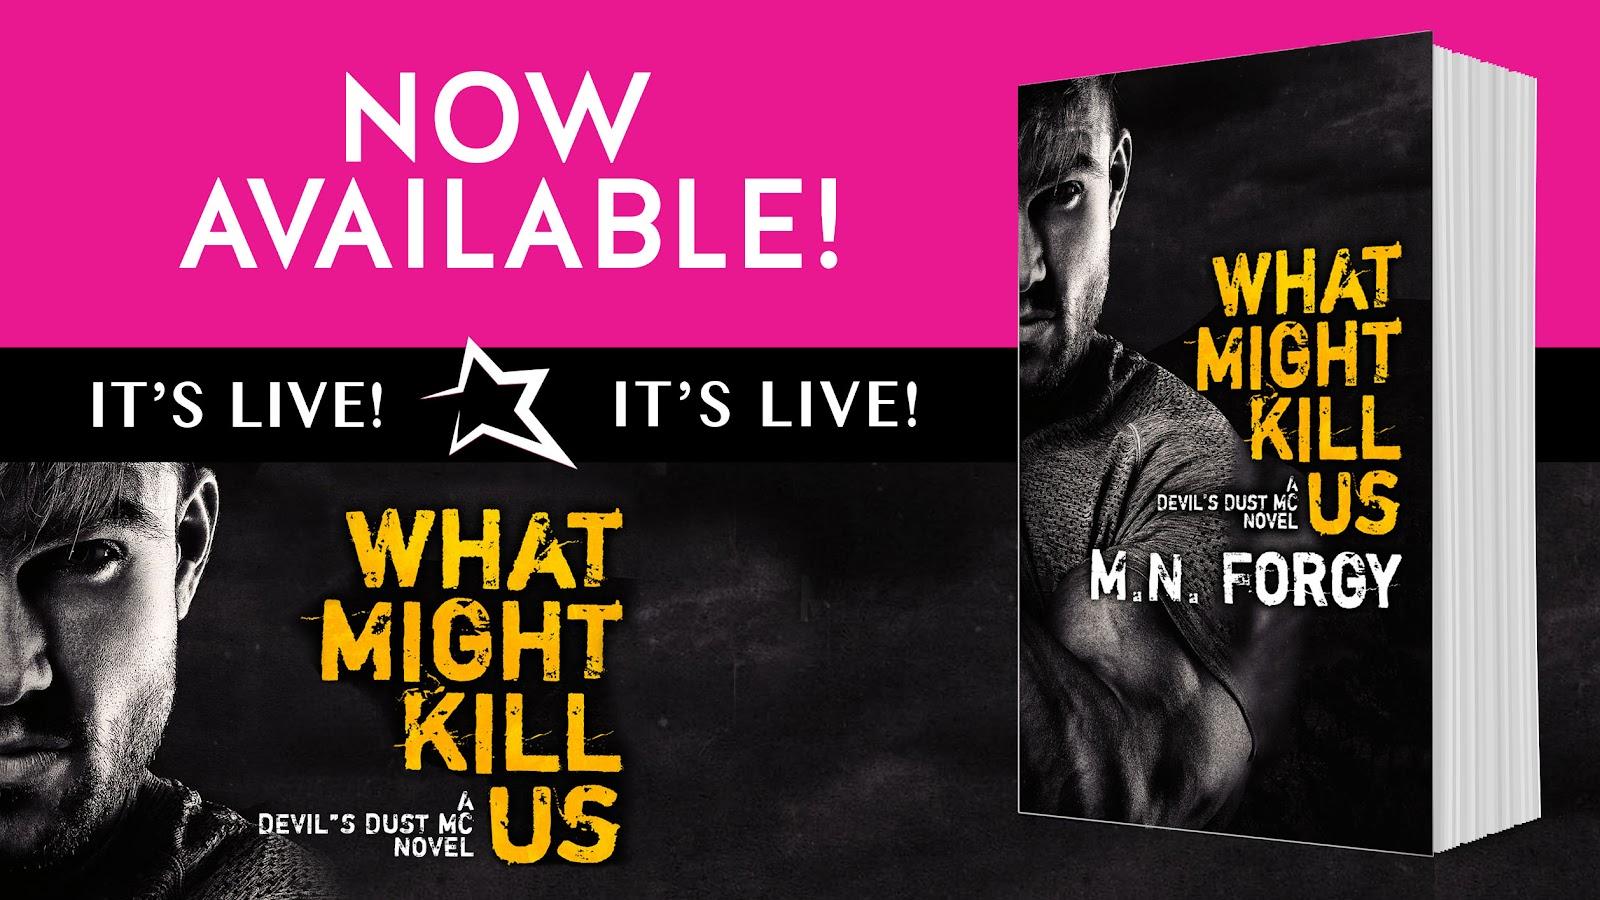 WHAT_MIGHT_KILL_US_LIVE.jpg